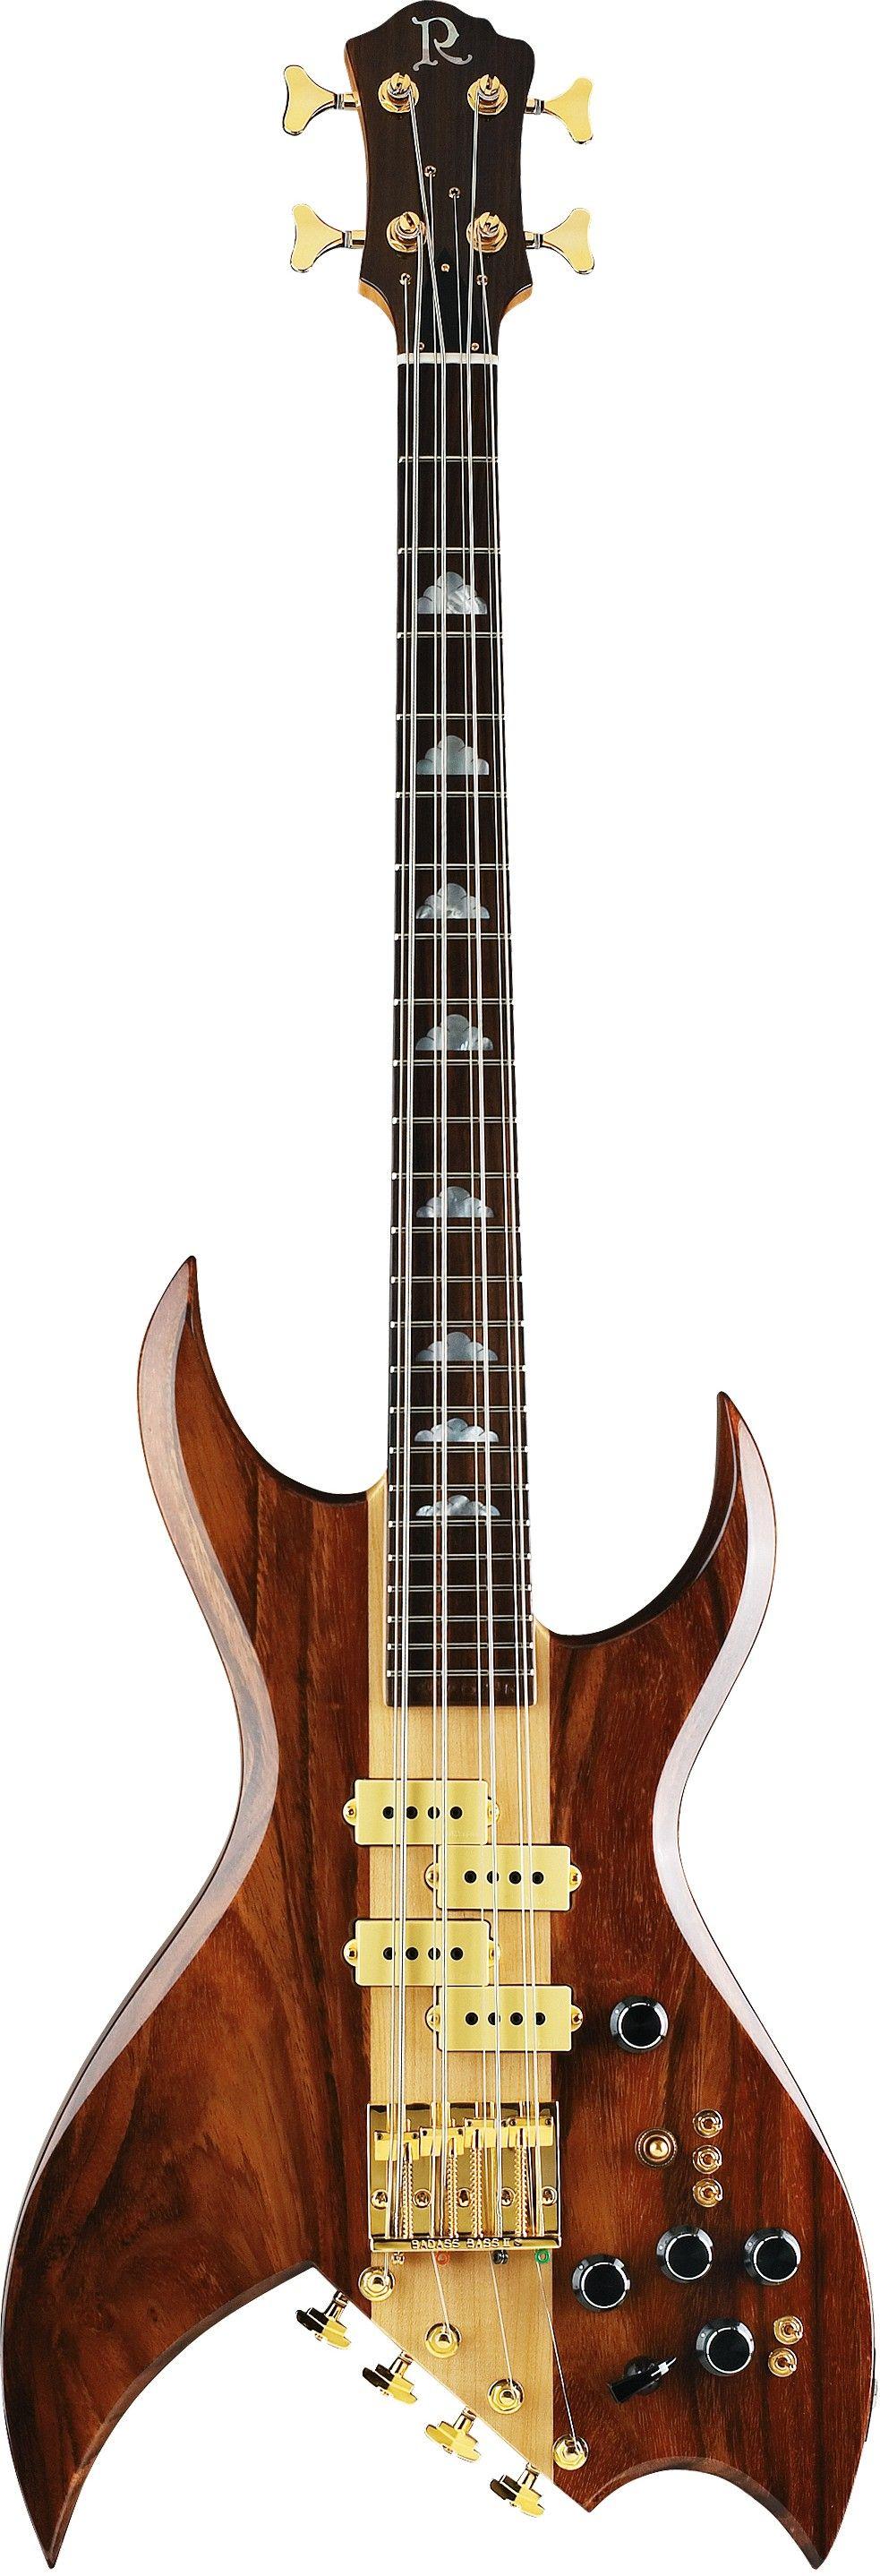 pin by claxton sticks wilson on bass foundation guitar music guitar custom guitars. Black Bedroom Furniture Sets. Home Design Ideas